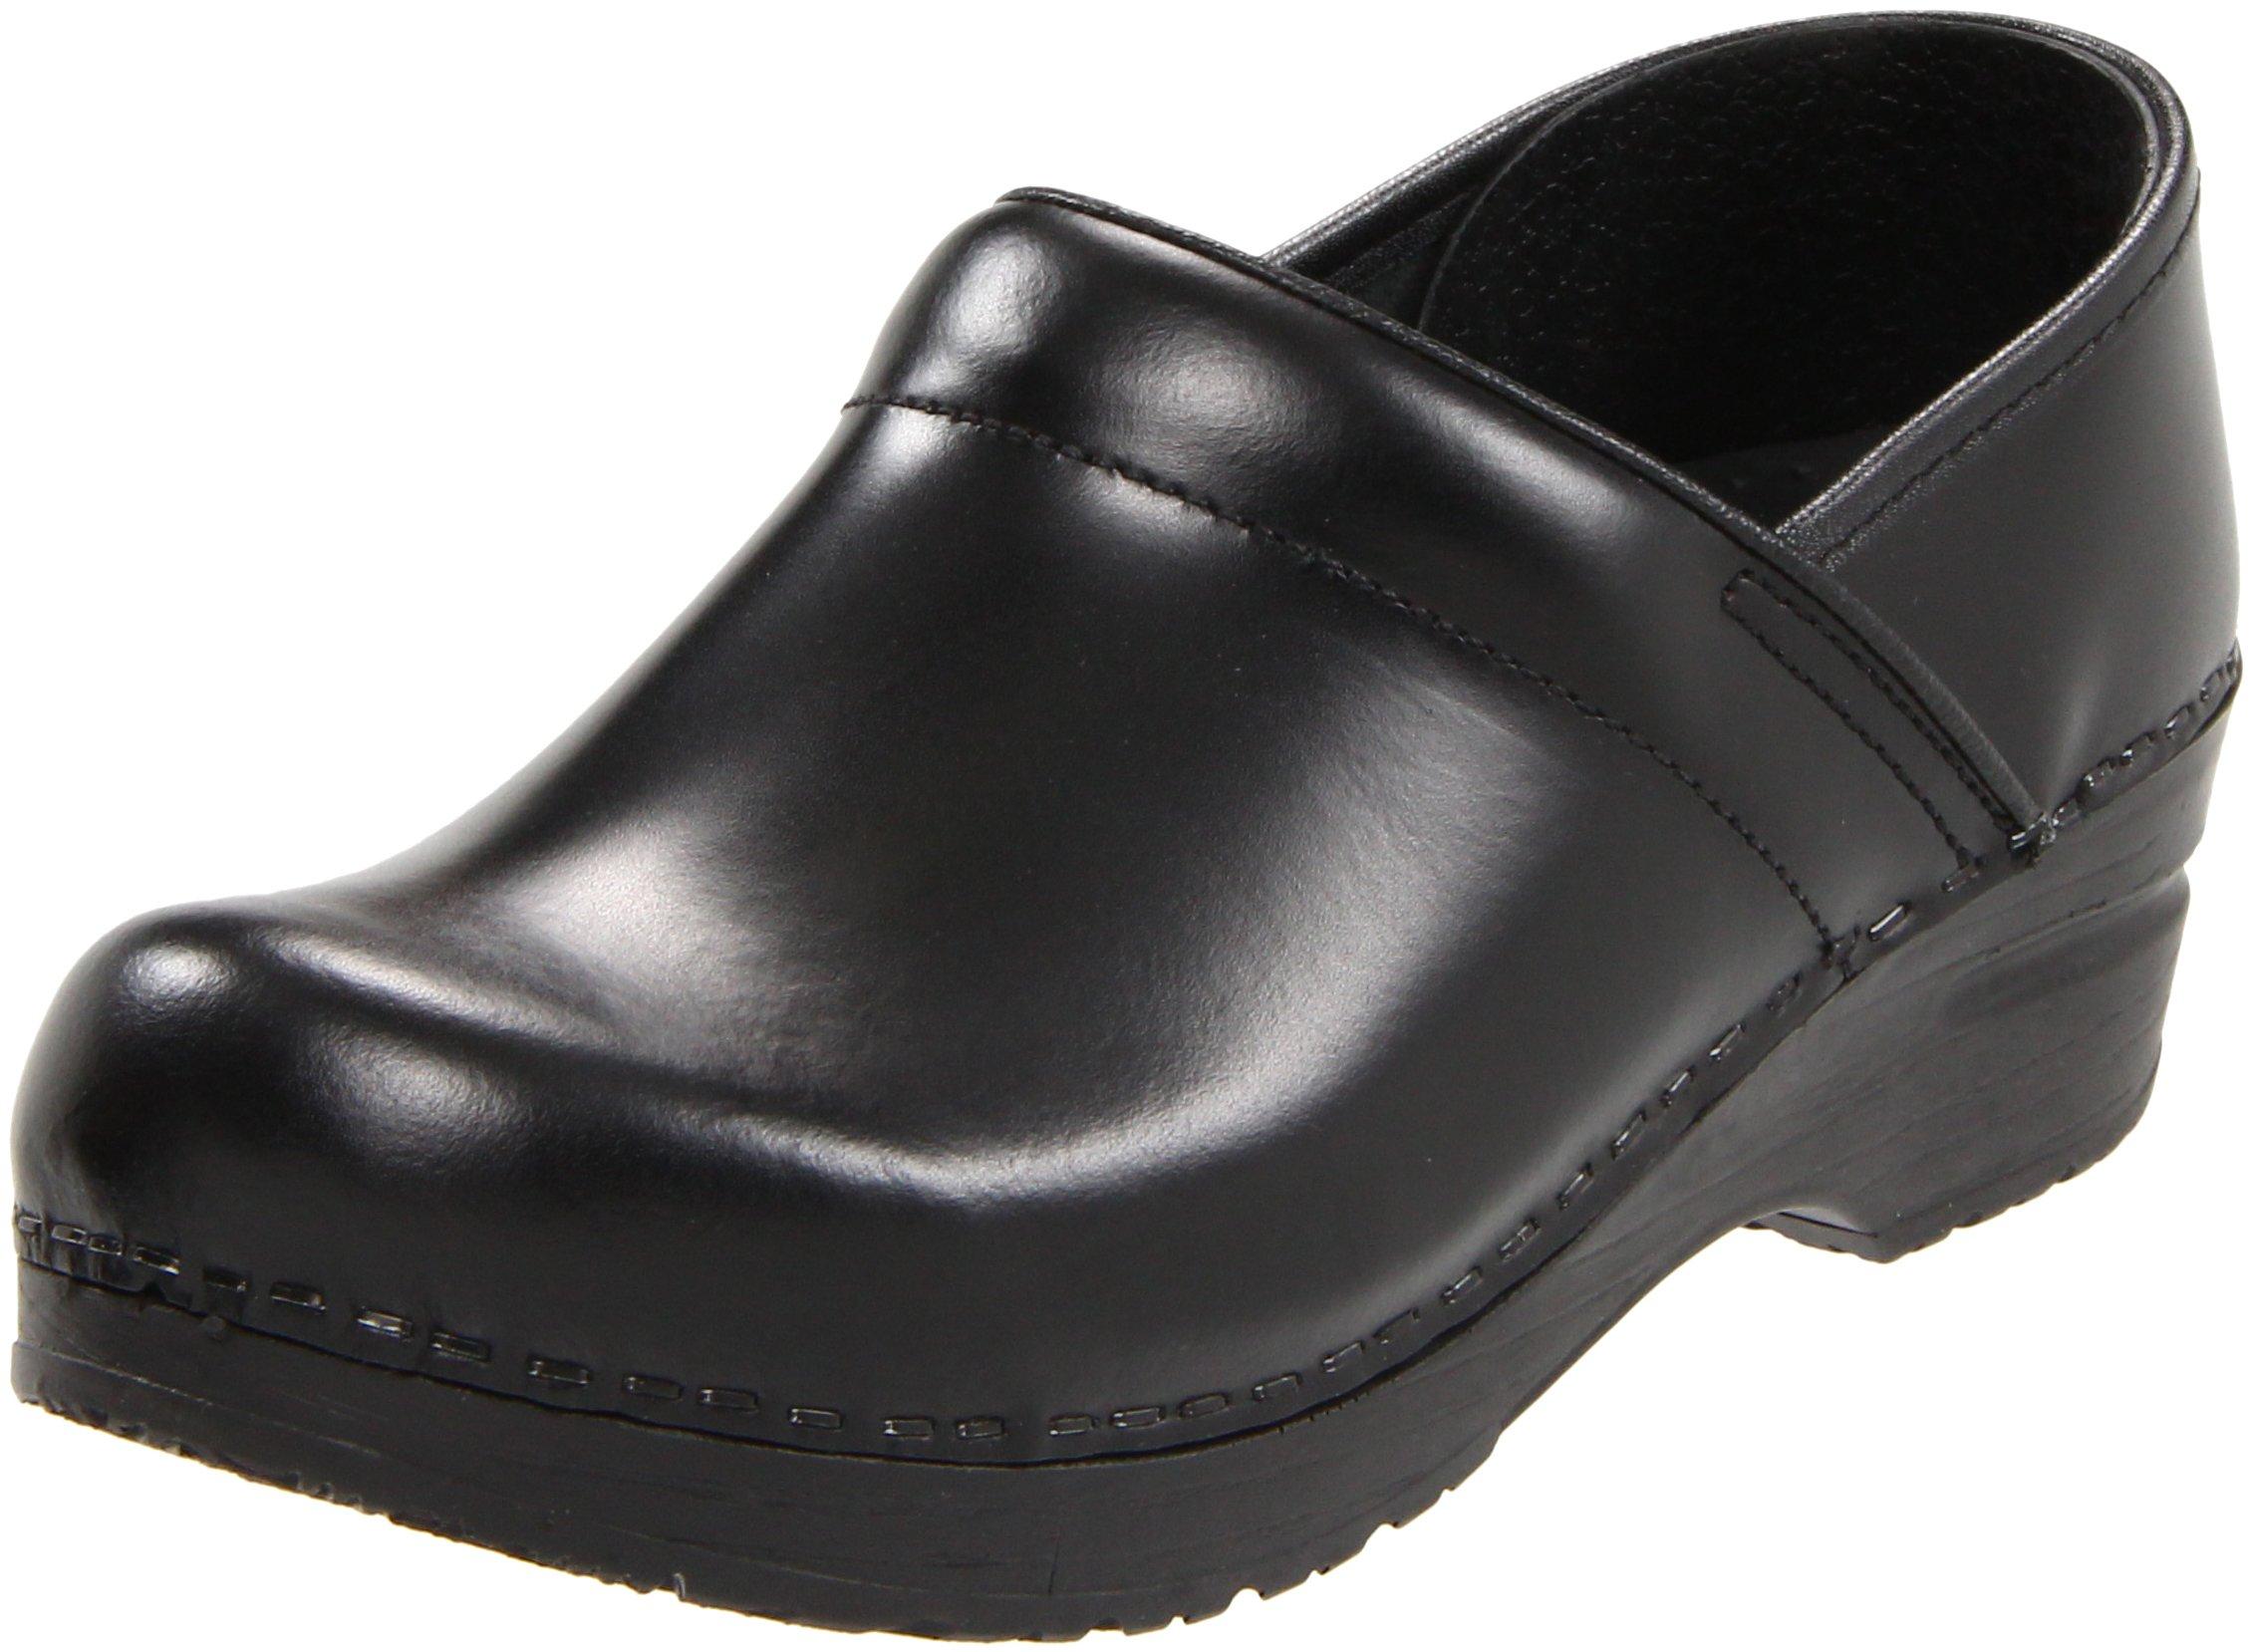 Sanita Clogs Women's Professional Cabrio,Black,EU 38 N